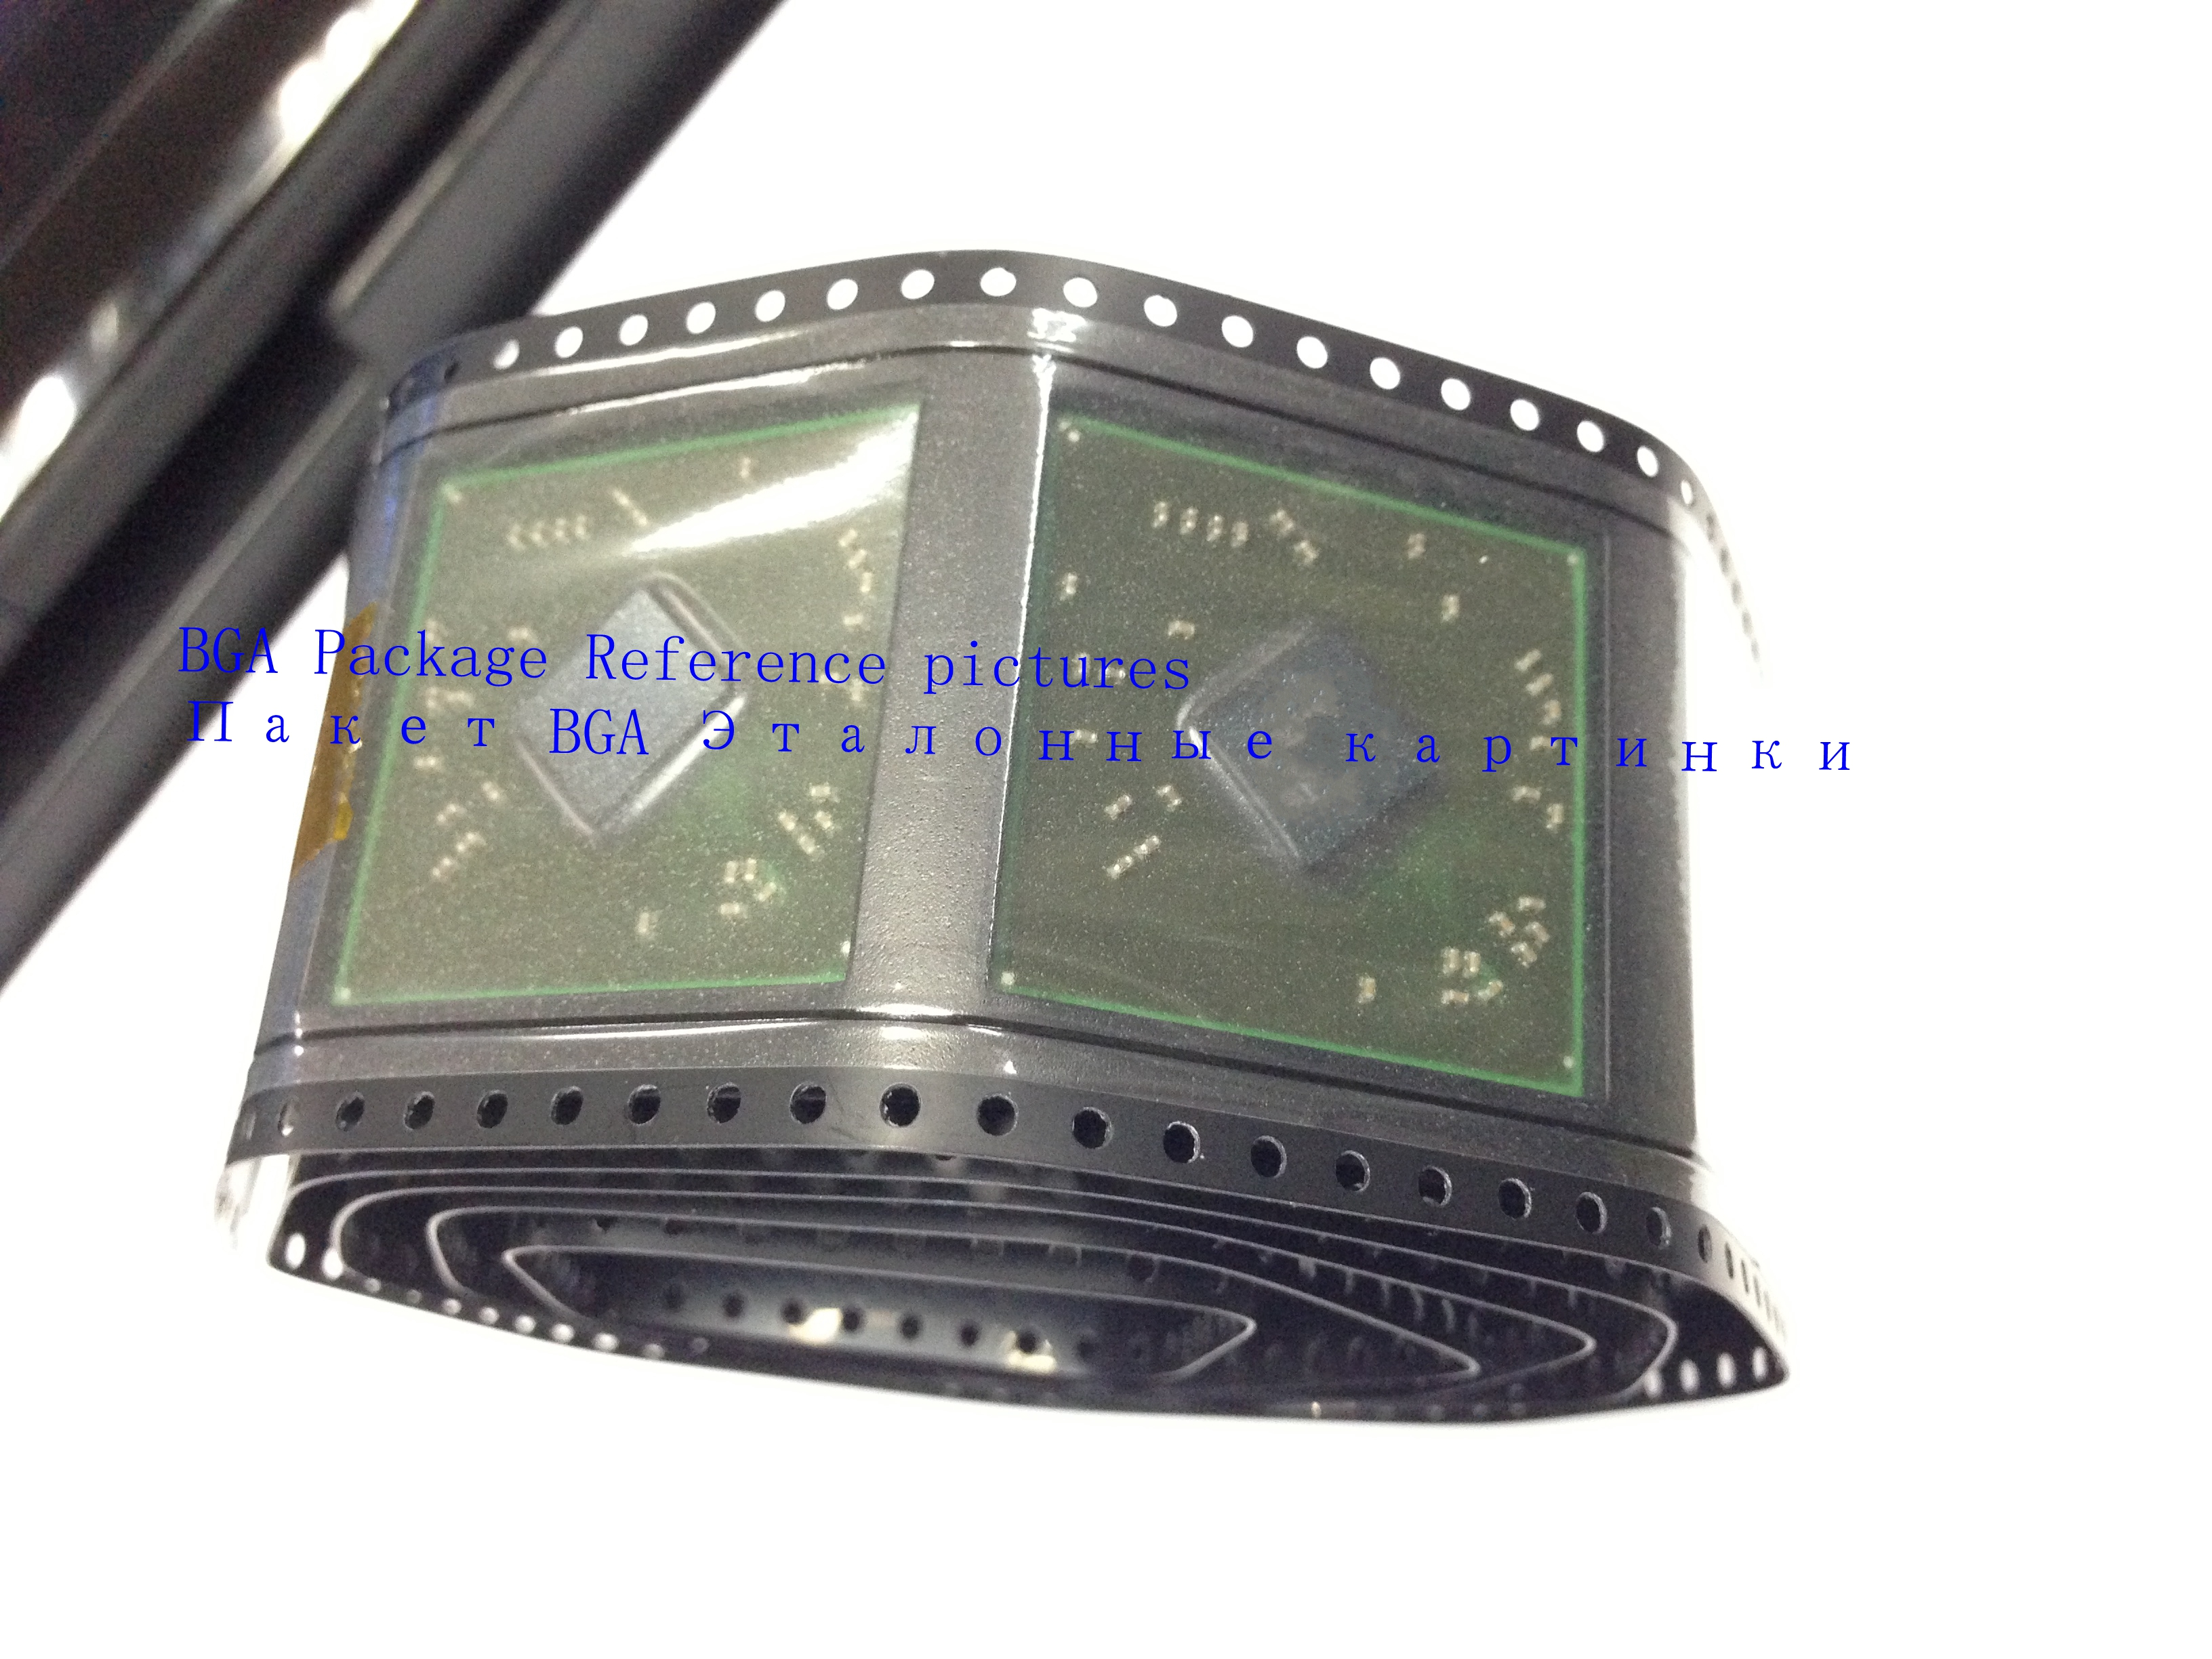 1pcs/lot 100% New NF-G6150-N-A2 NF G6150 N A2 BGA Chipset